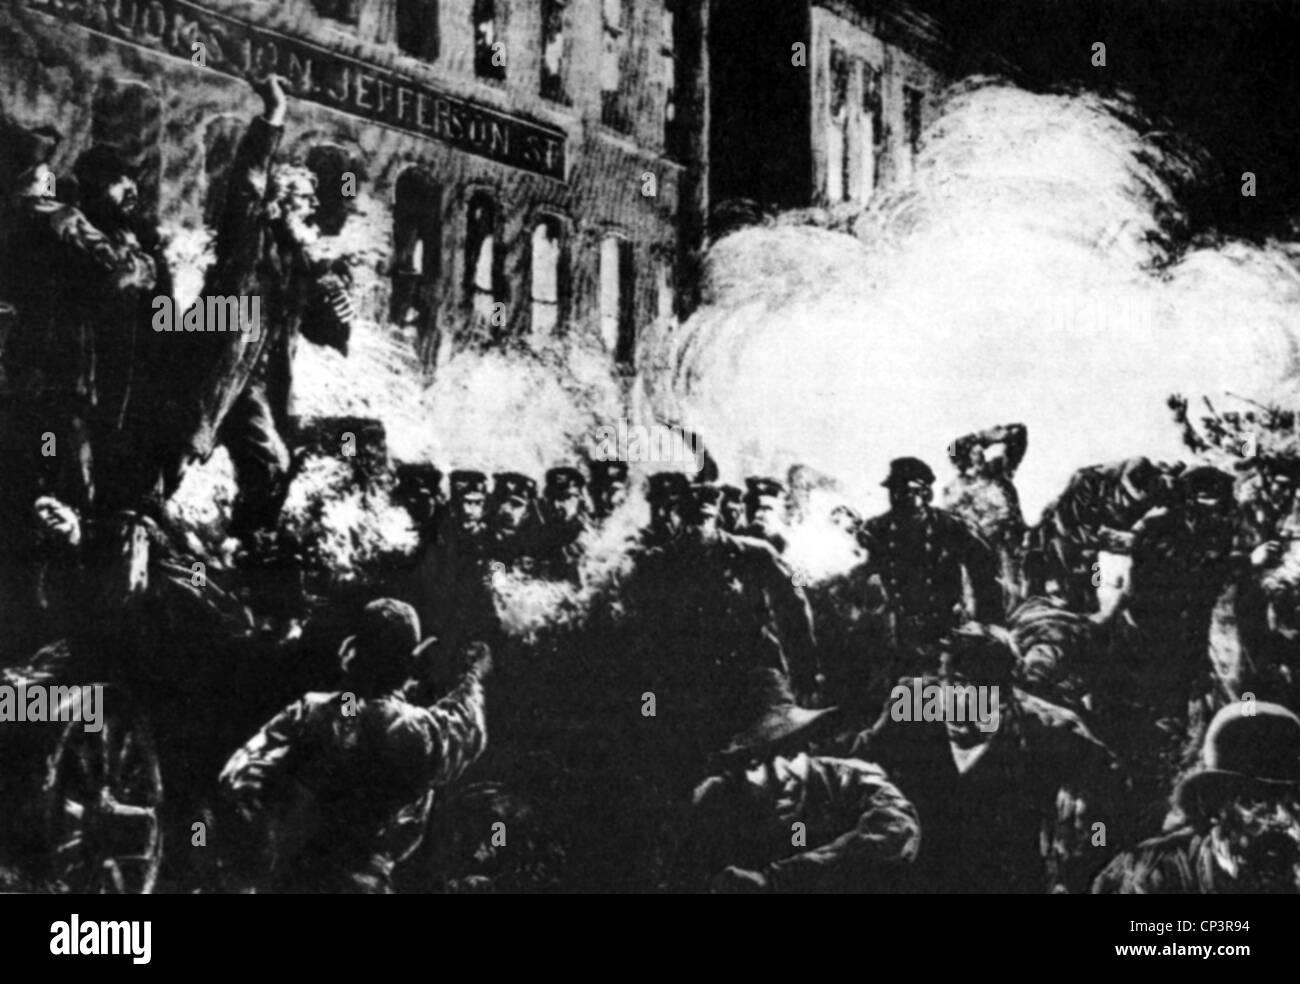 events, Haymarket Riot, May 1886, policemen beat demonstrators with sticks, strike, strikes, riot, riots, tumult, - Stock Image